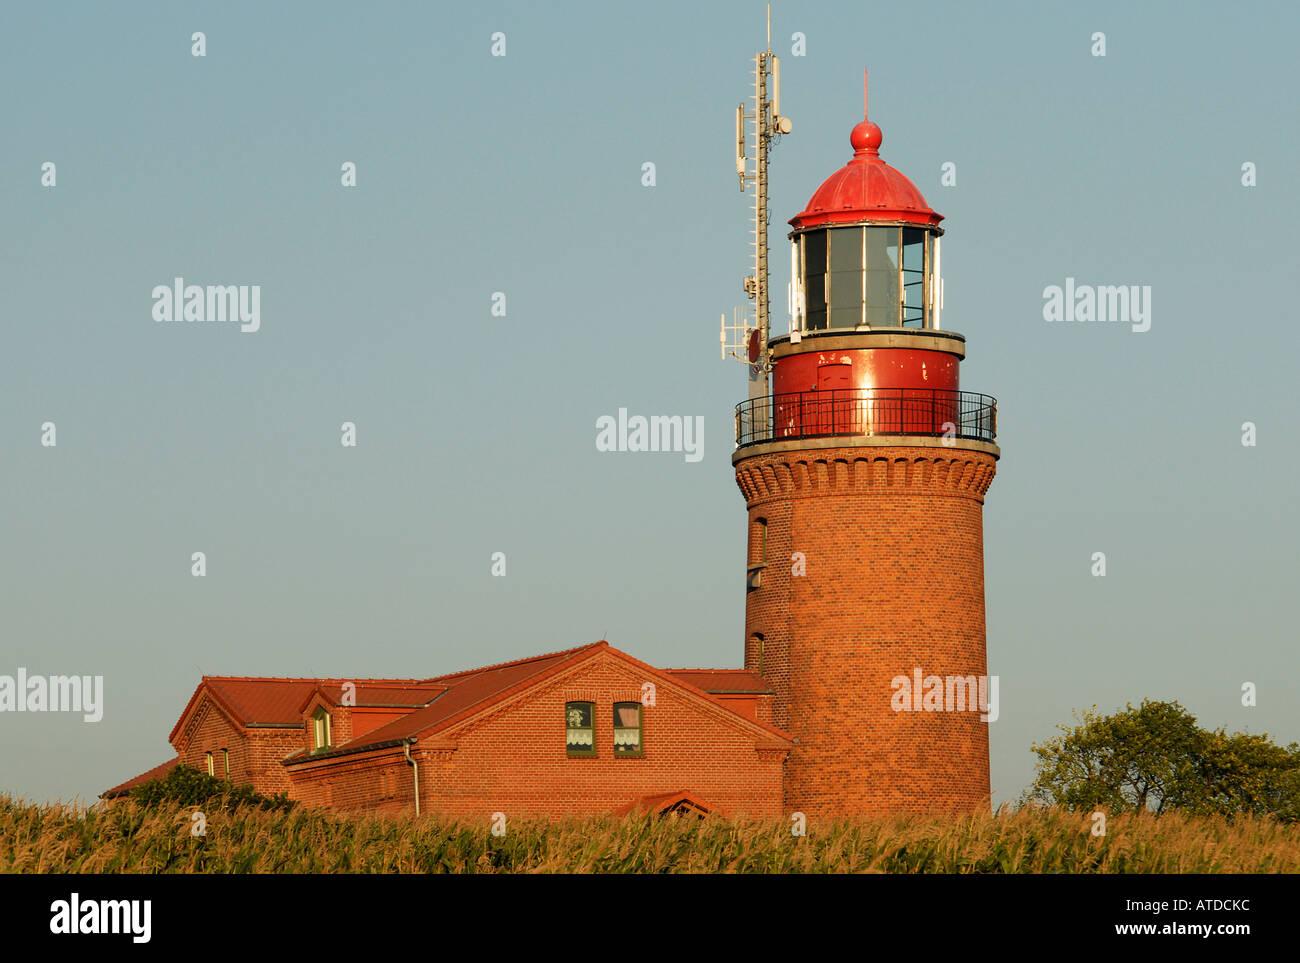 Old lighthouse in Bastorf near Kuehlungsborn, Western-Pomerania, Germany Stock Photo